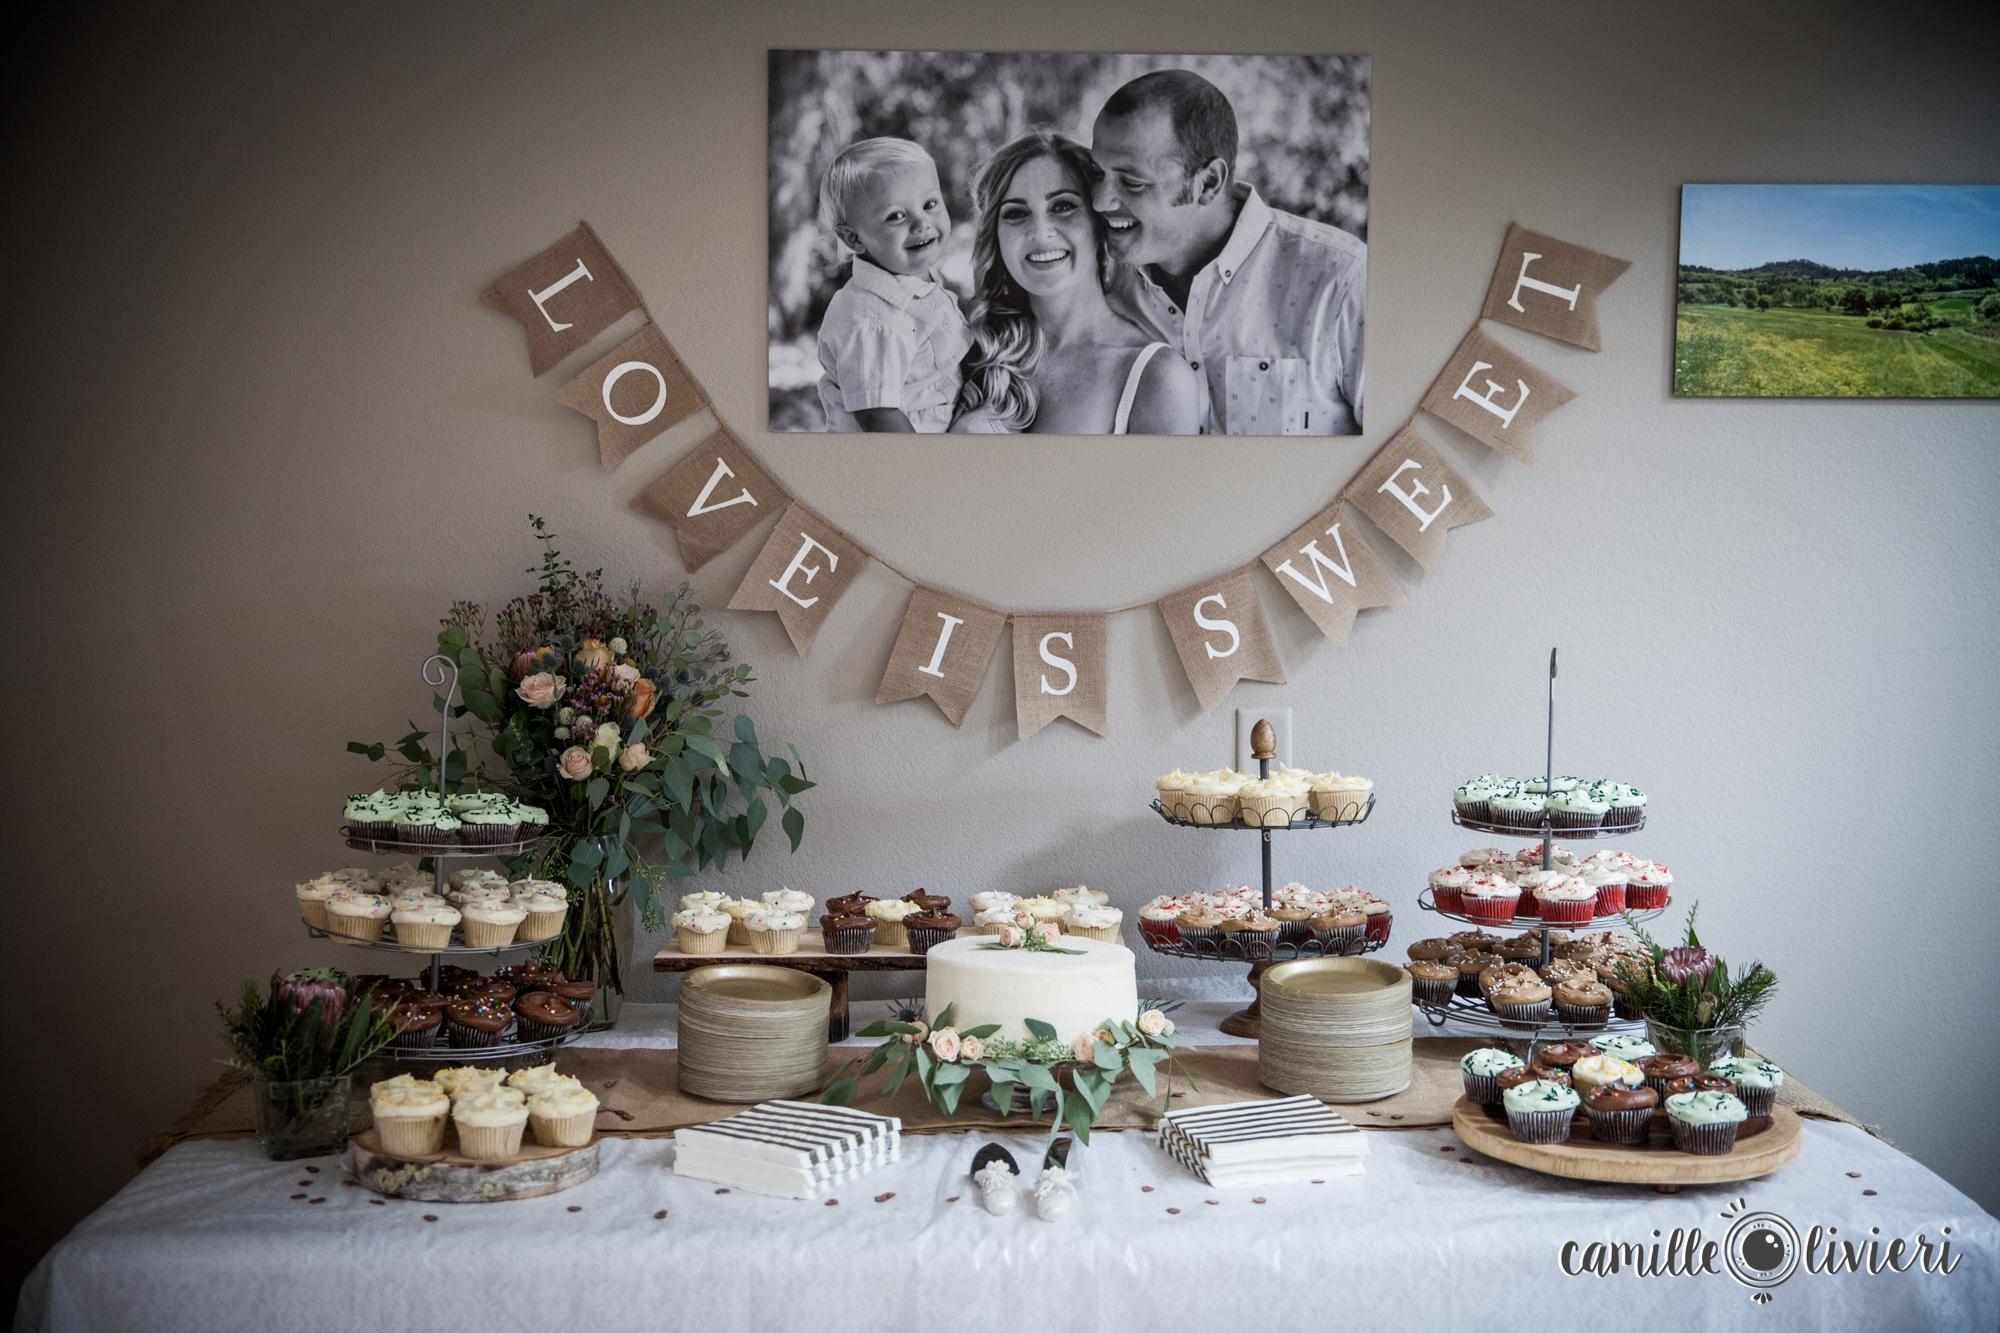 photographe_grenoble_mariage-camille-olivieri-25